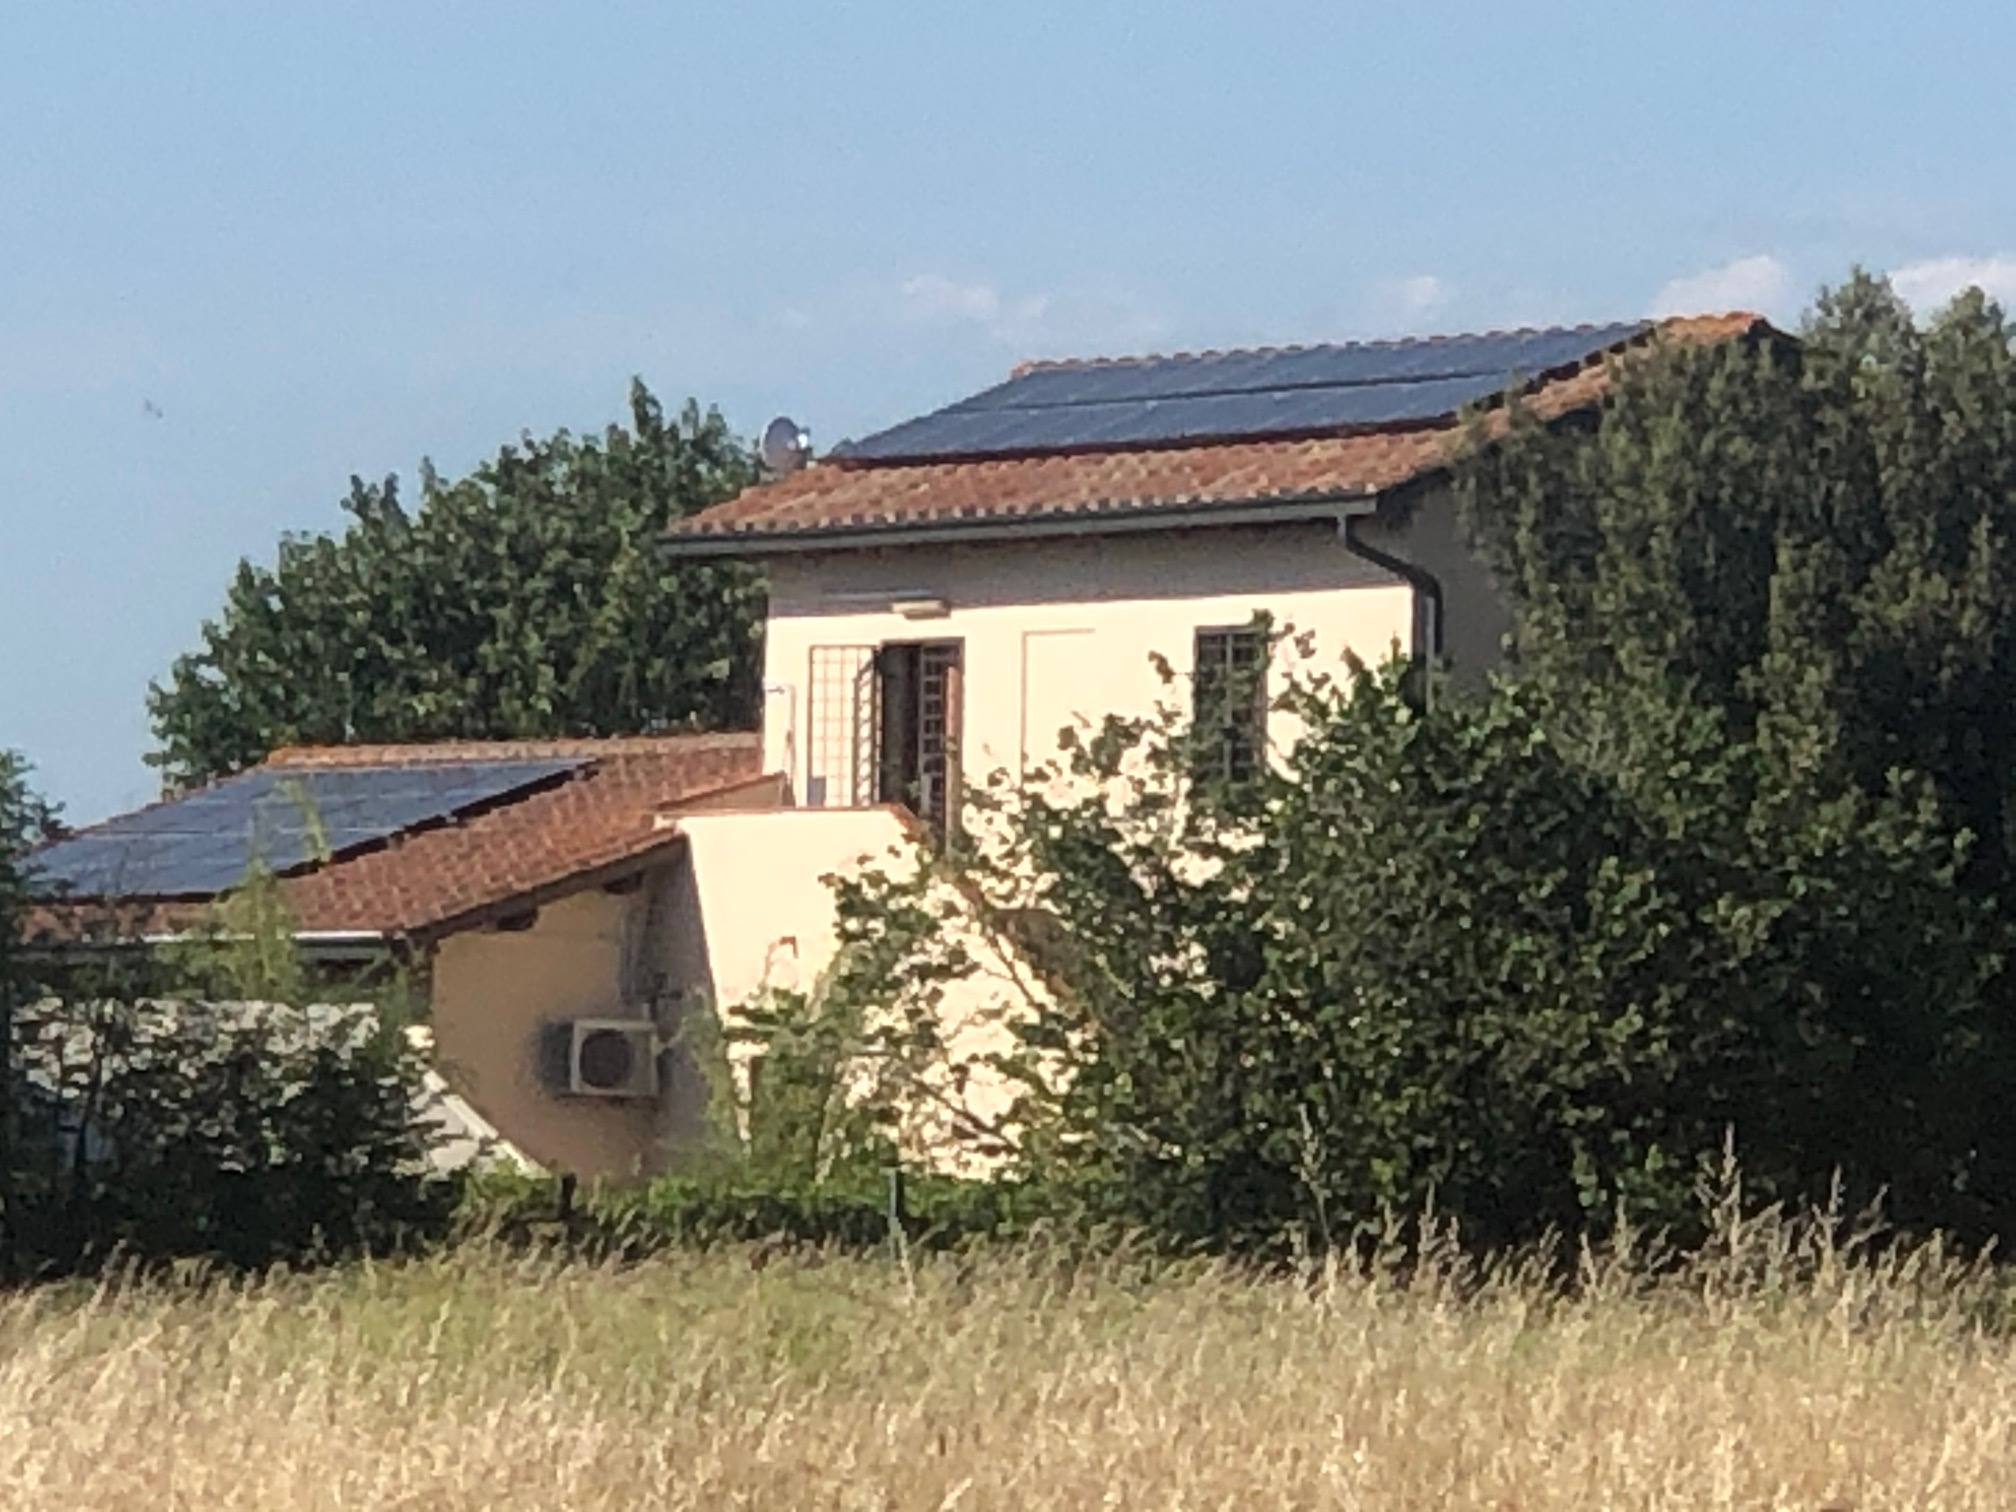 L'energia è verde all'Orto Botanico Tor Vergata